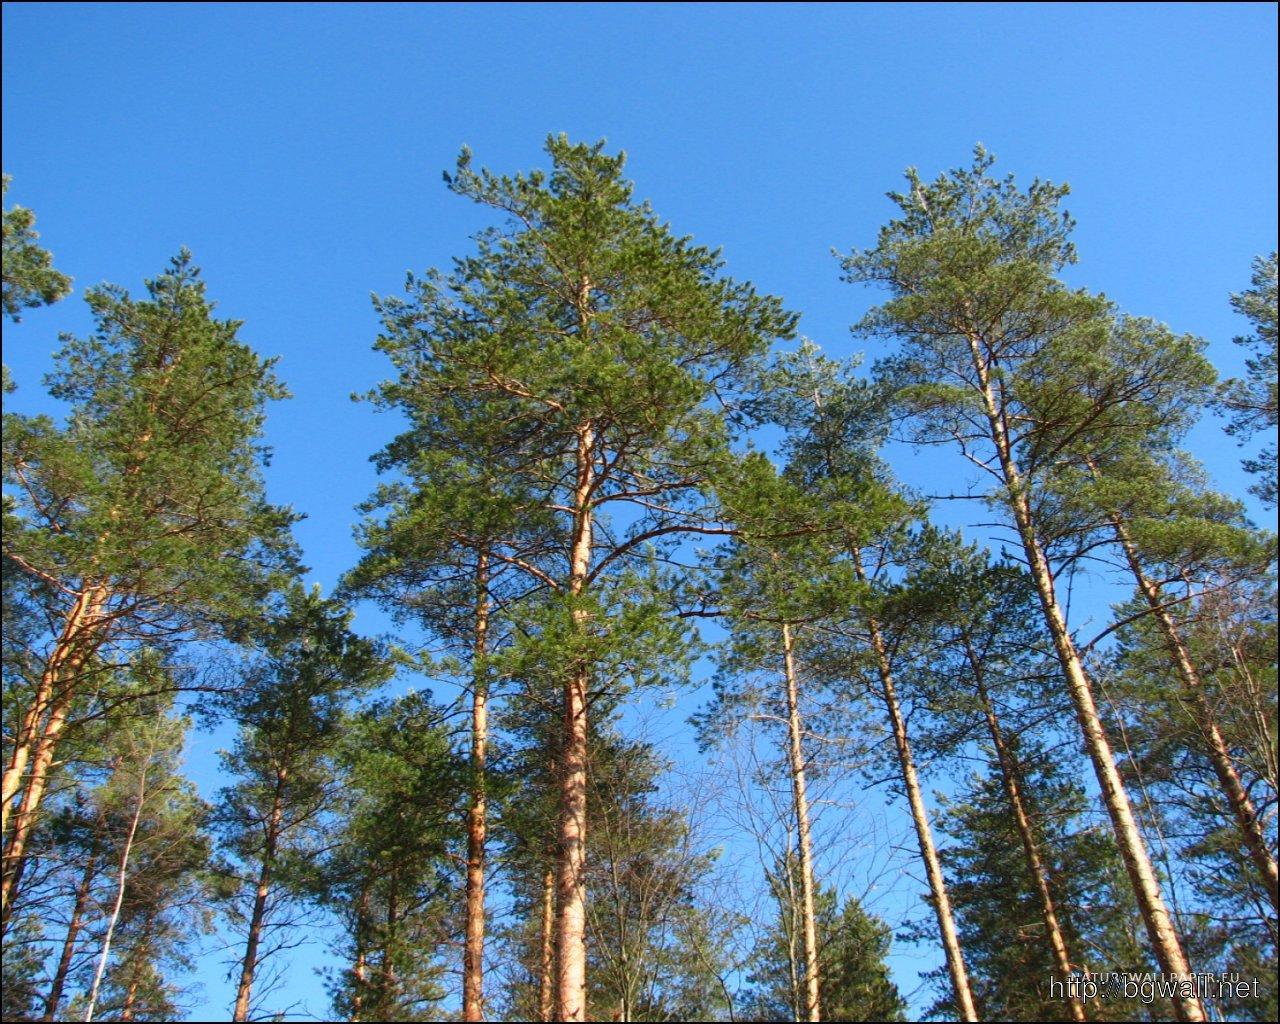 1280 1024 wallpaper pine trees wallpaper background for Tree wallpaper for home